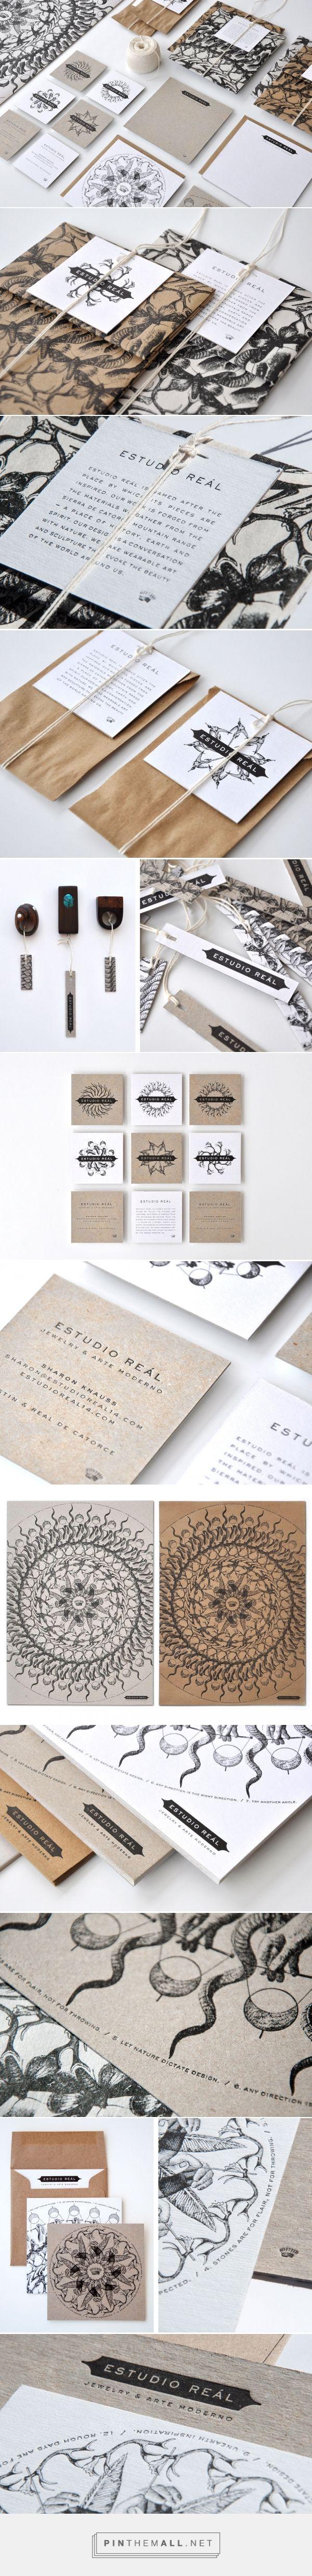 Estudio Reál Branding by Design Ranch.